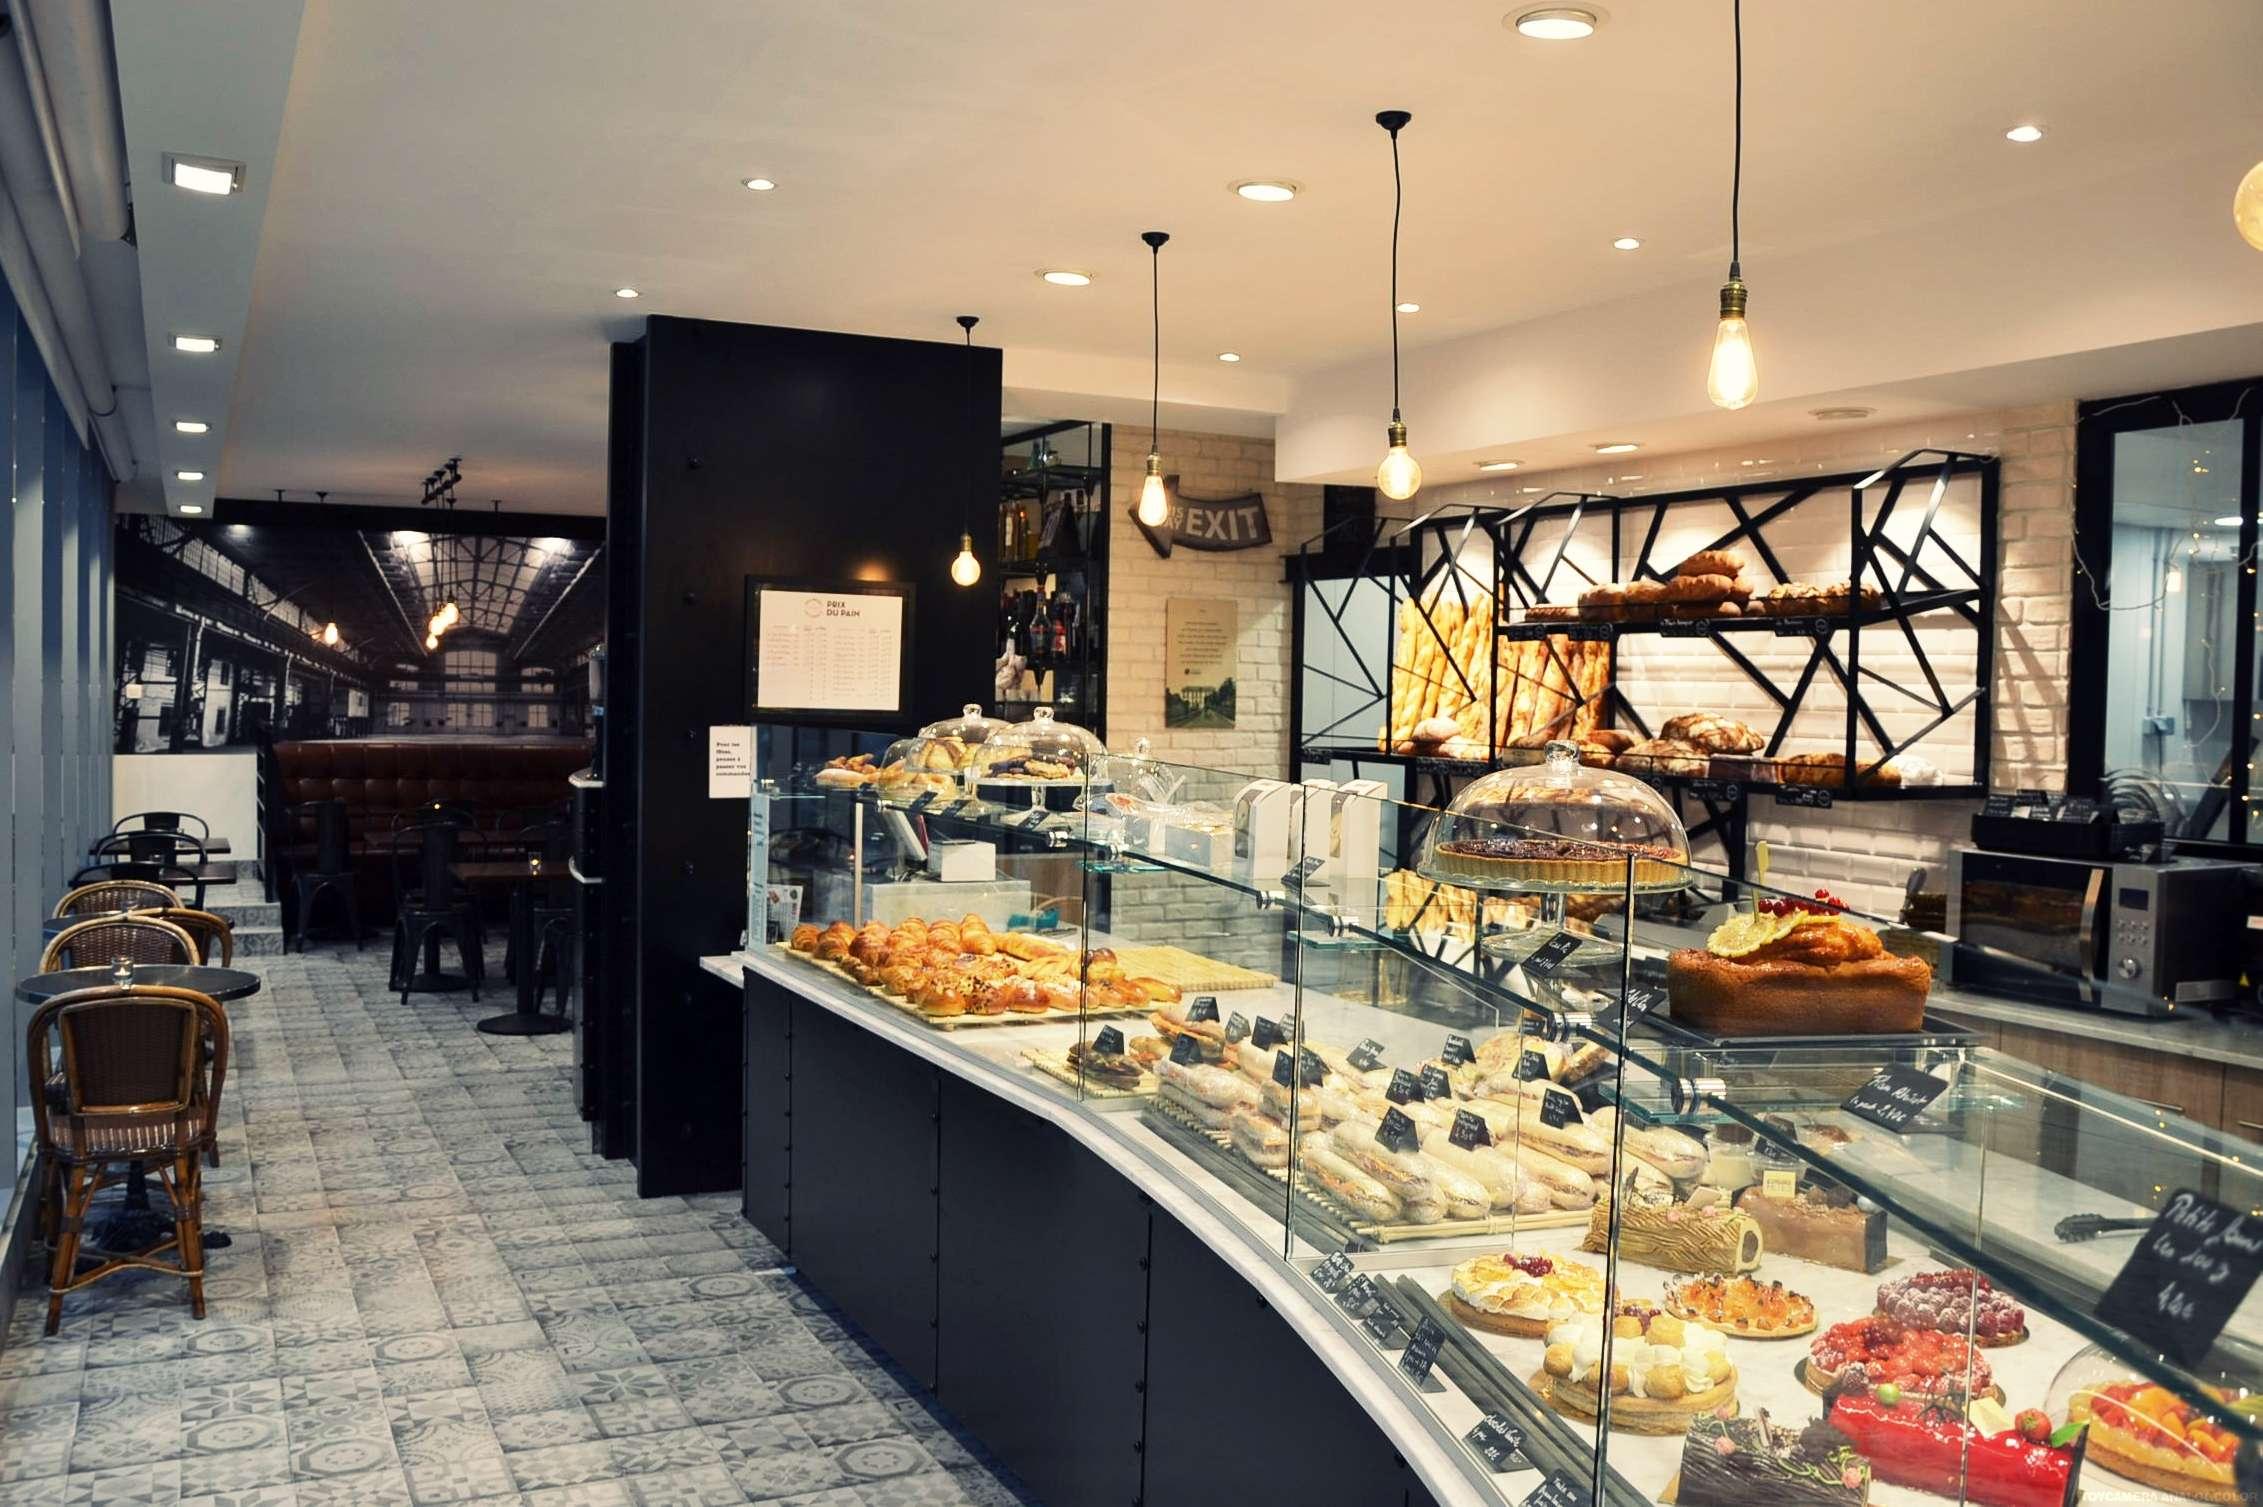 Restaurant Cafe De Paris